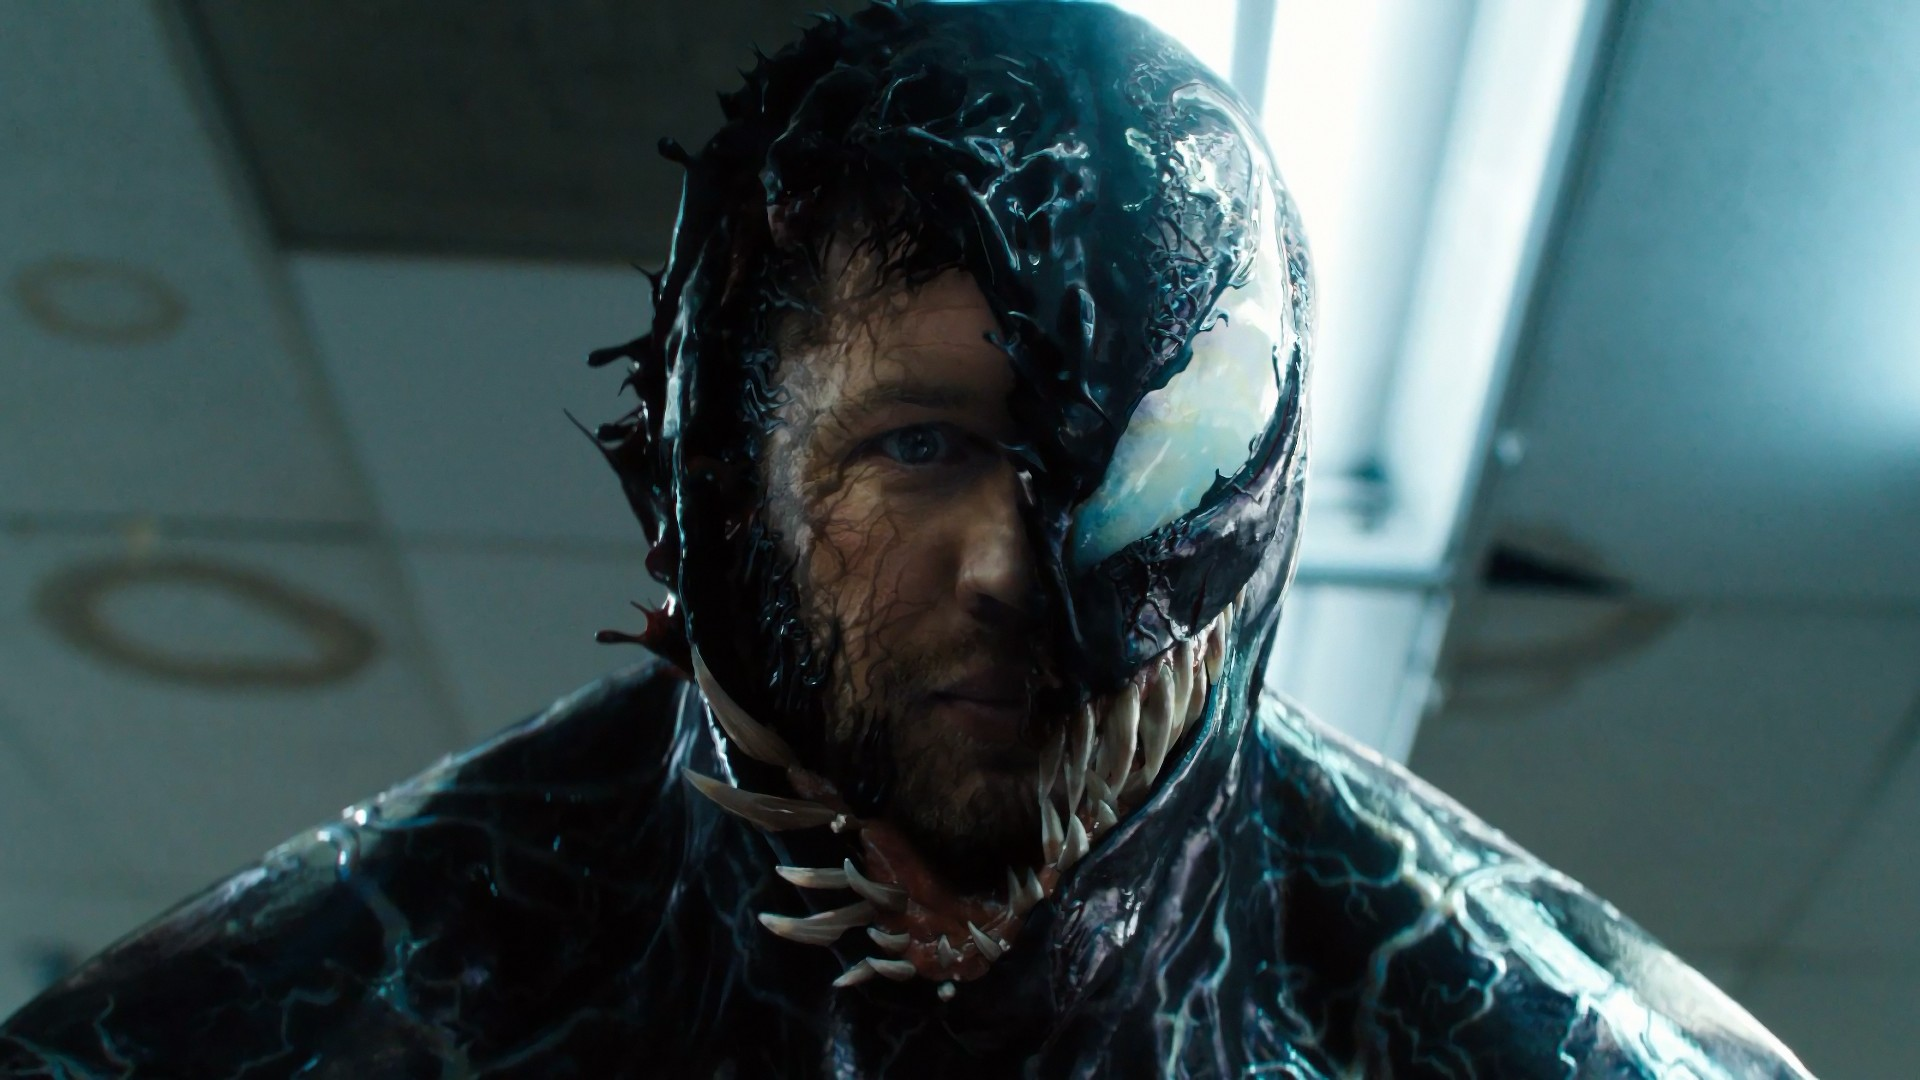 Wallpaper Venom Tom Hardy 4k Movies 19990